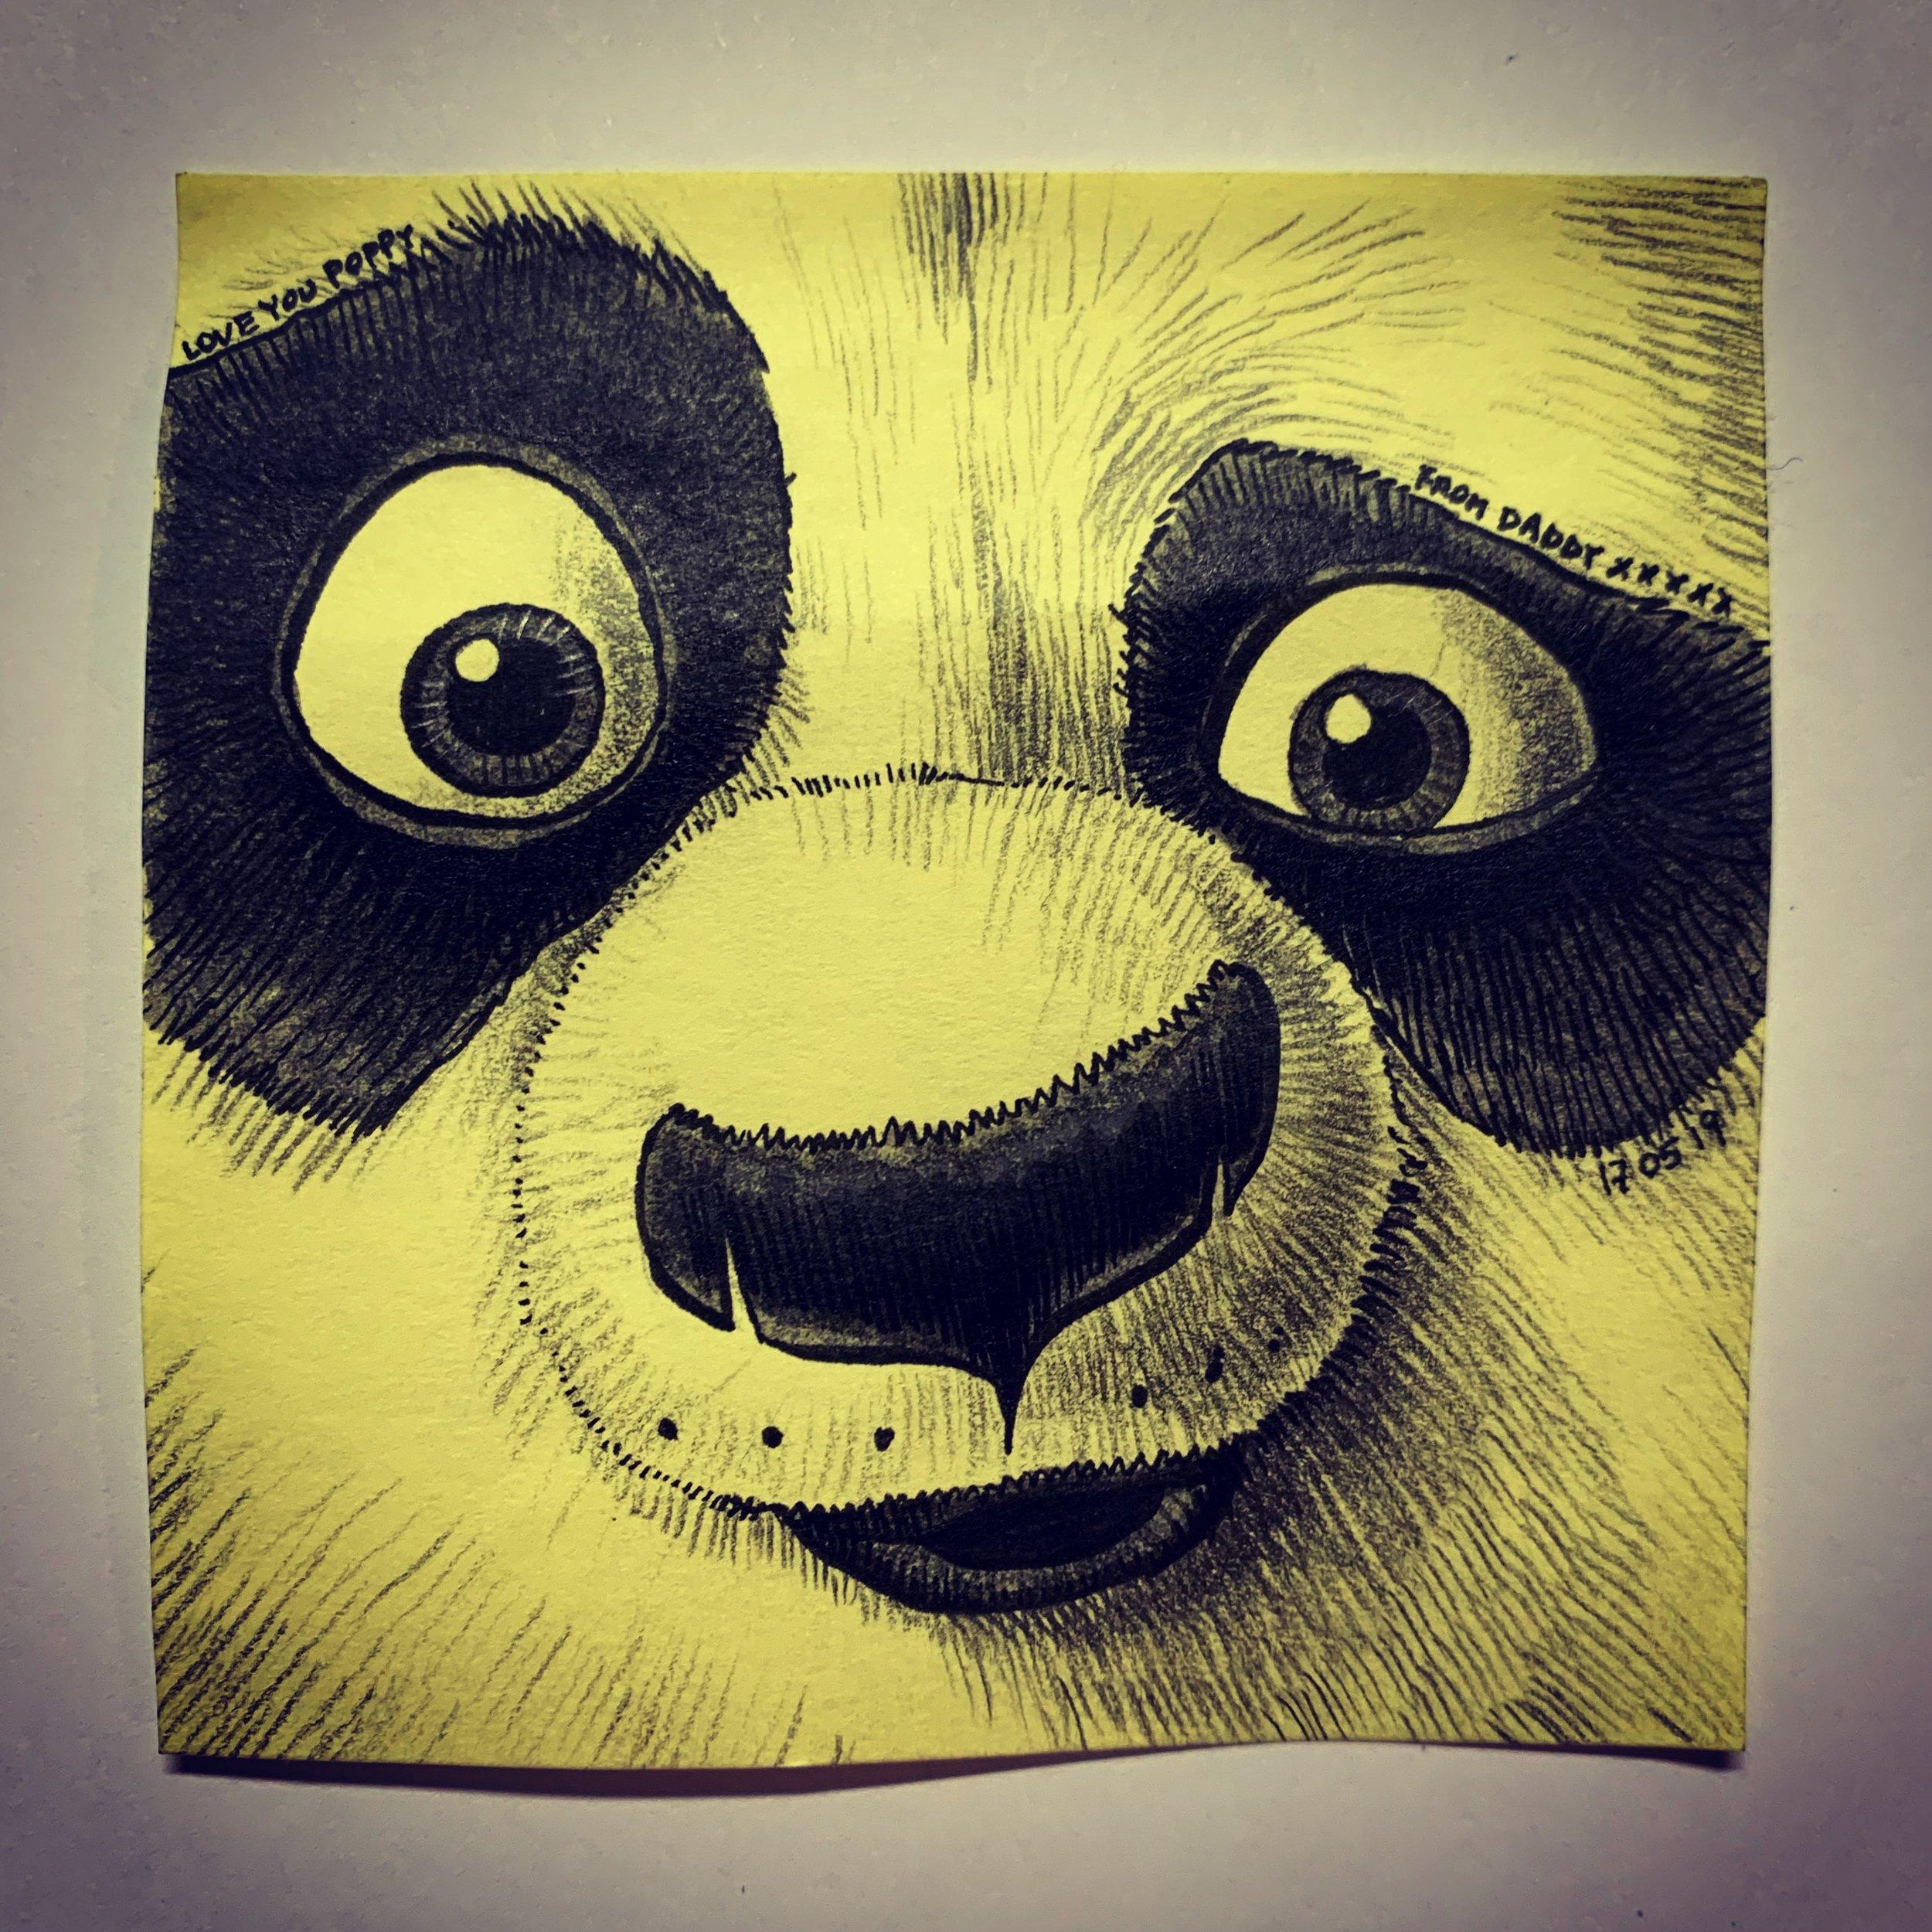 Po, the Kung Fu Panda